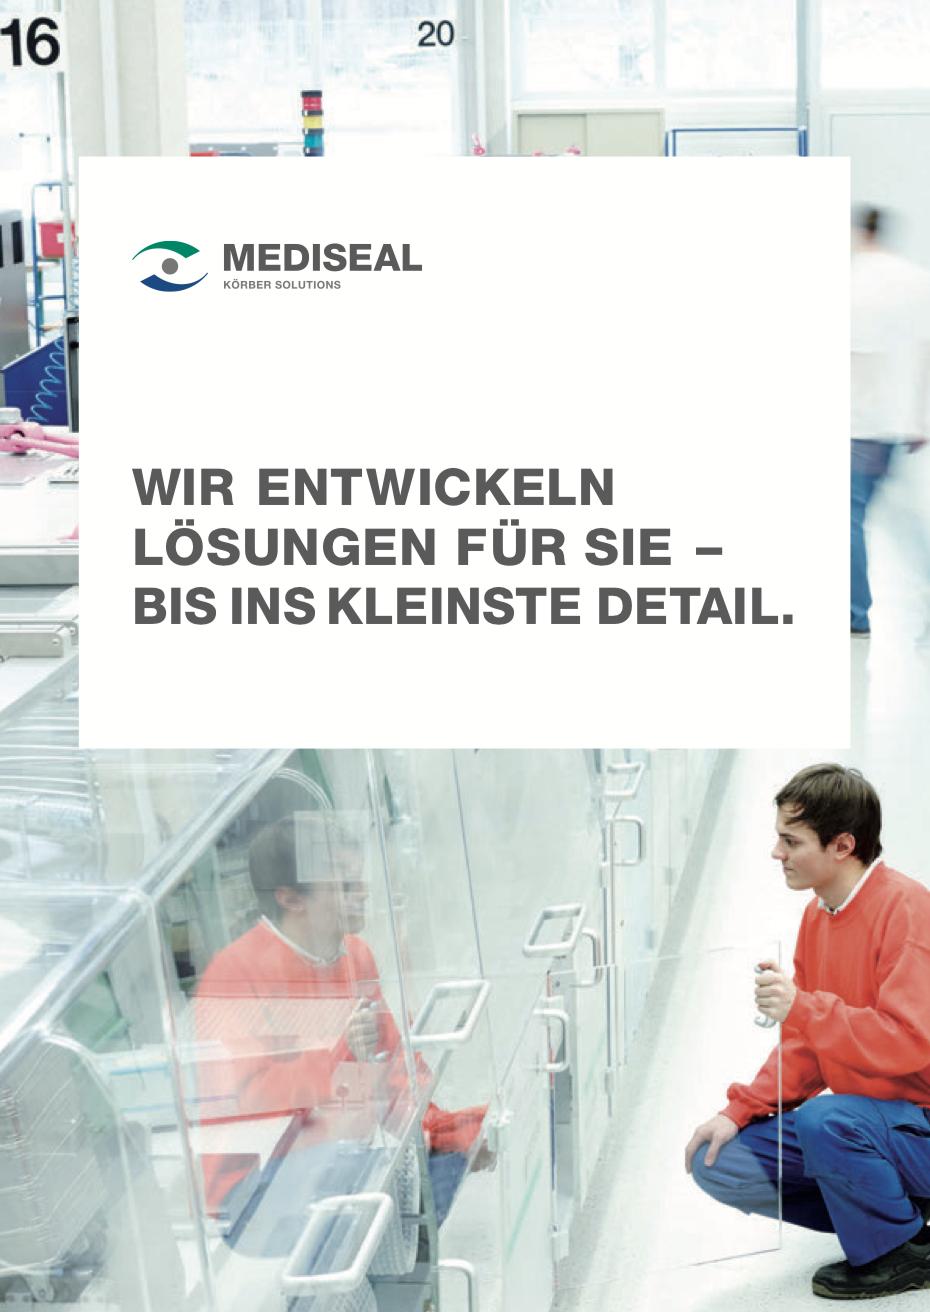 Mediseal Kundenbroschüre